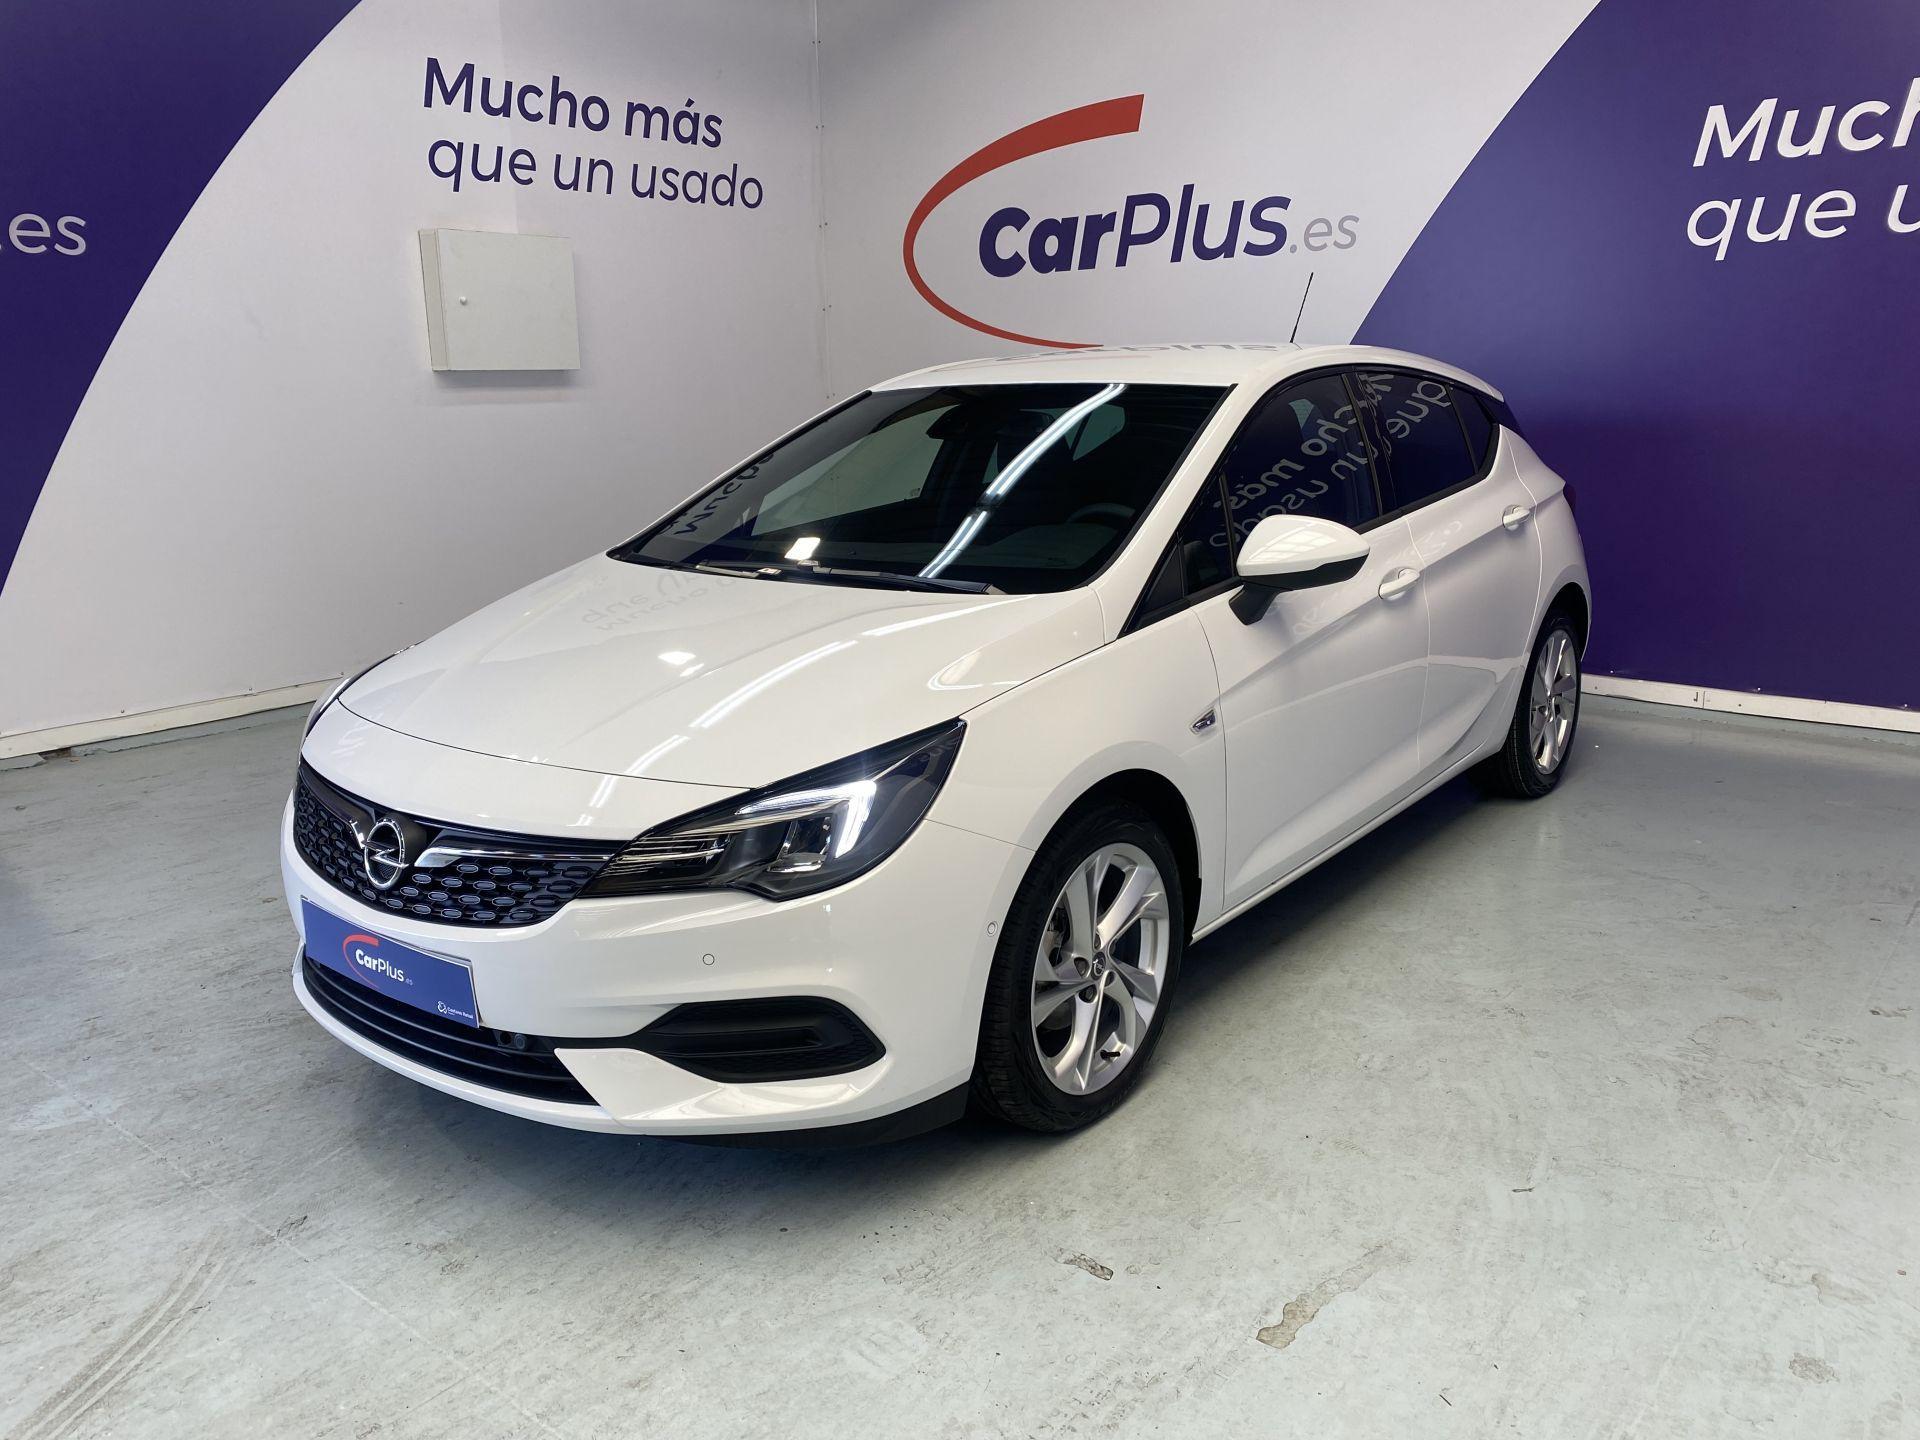 Opel Astra ocasión segunda mano 2021 Diésel por 17.990€ en Madrid